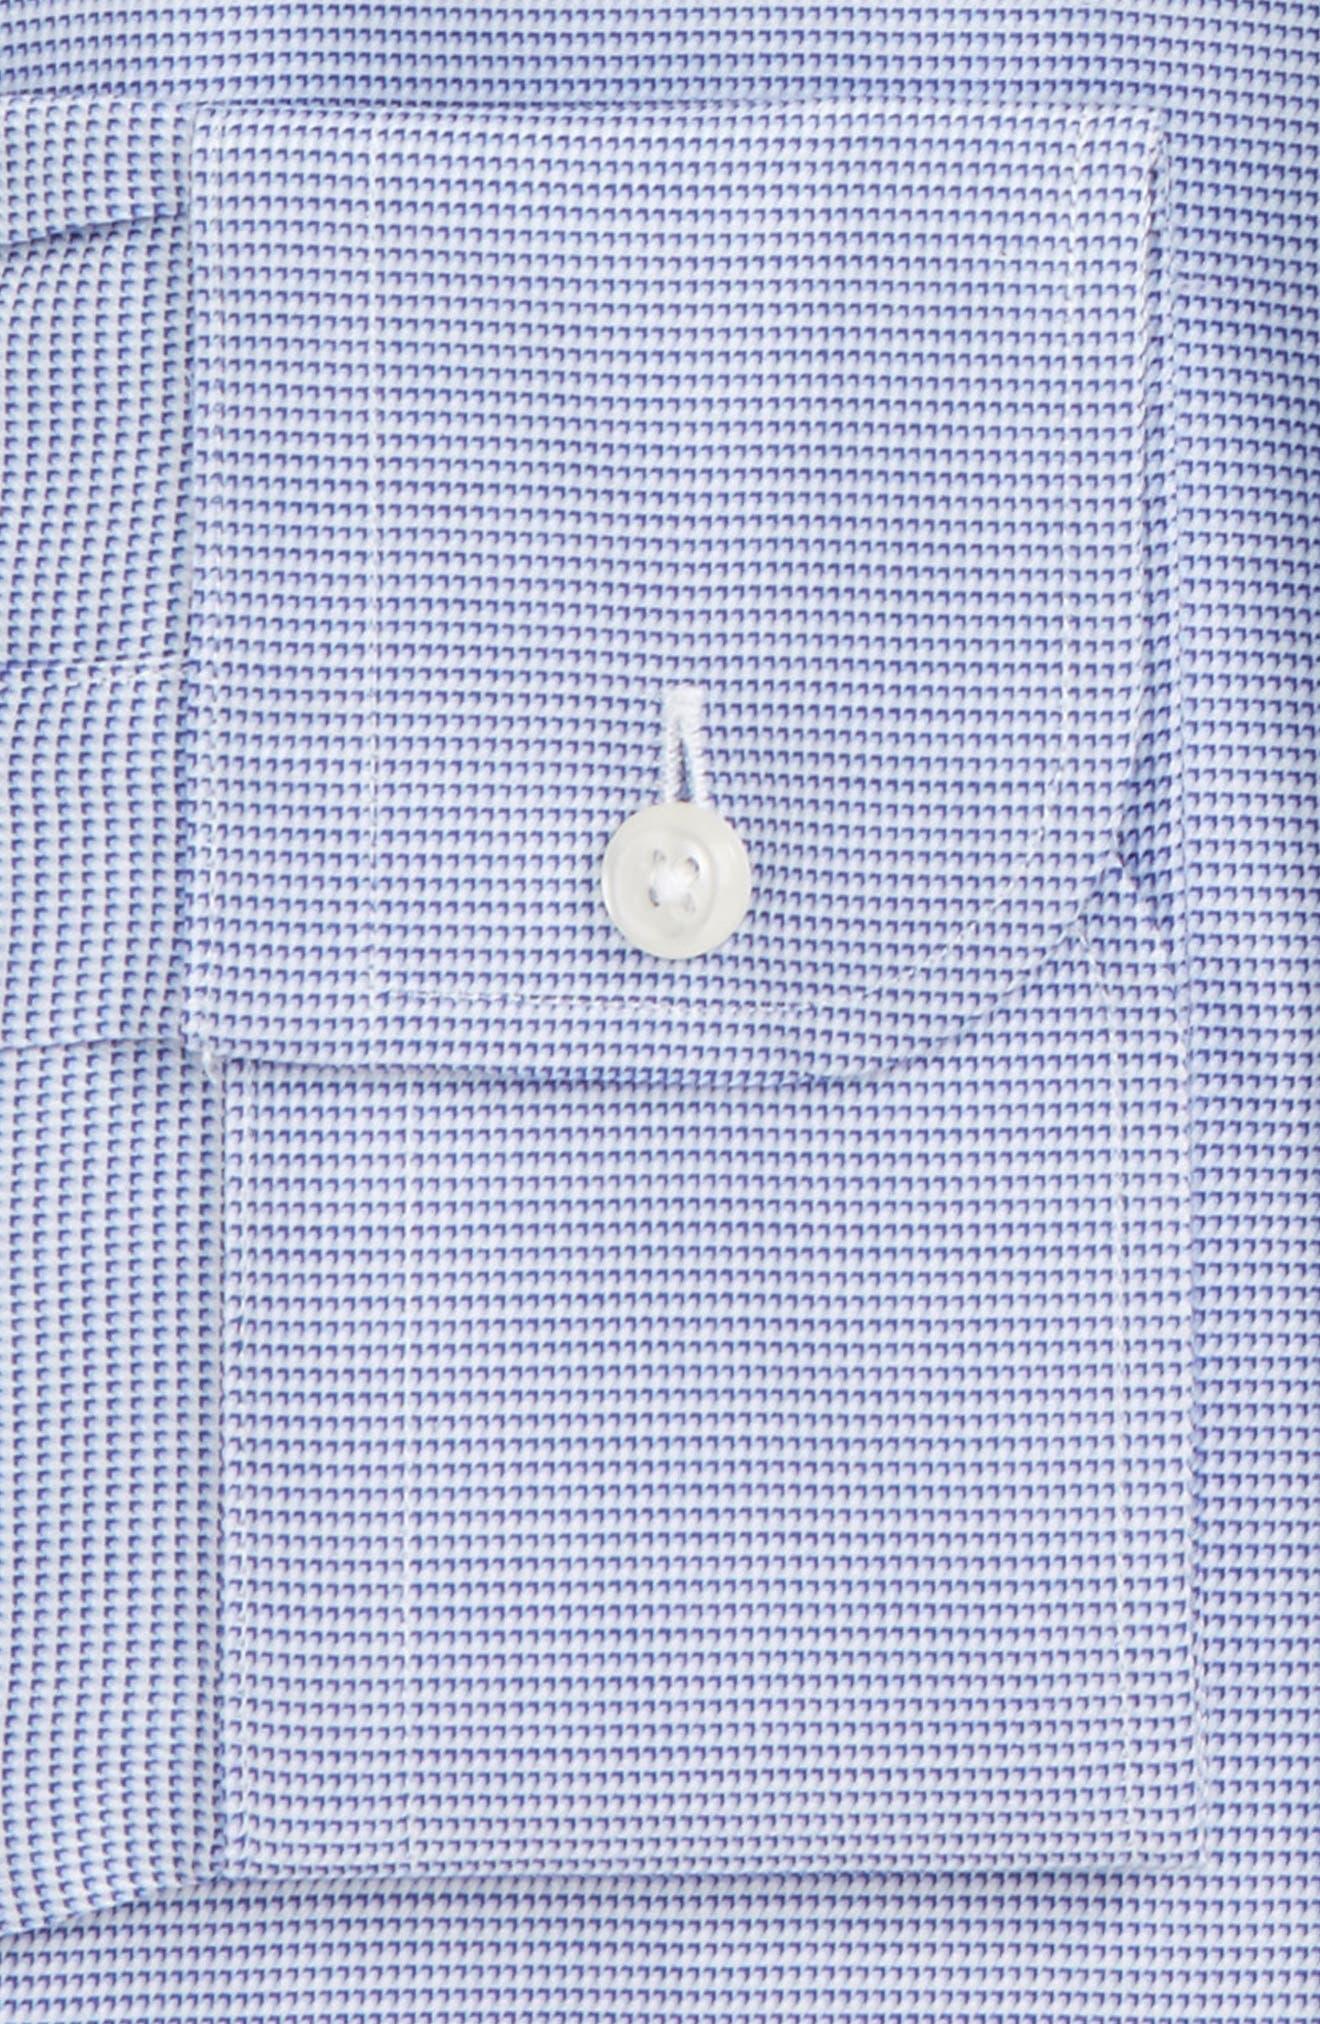 Classic Fit Solid Dress Shirt,                             Alternate thumbnail 2, color,                             Blue Marine